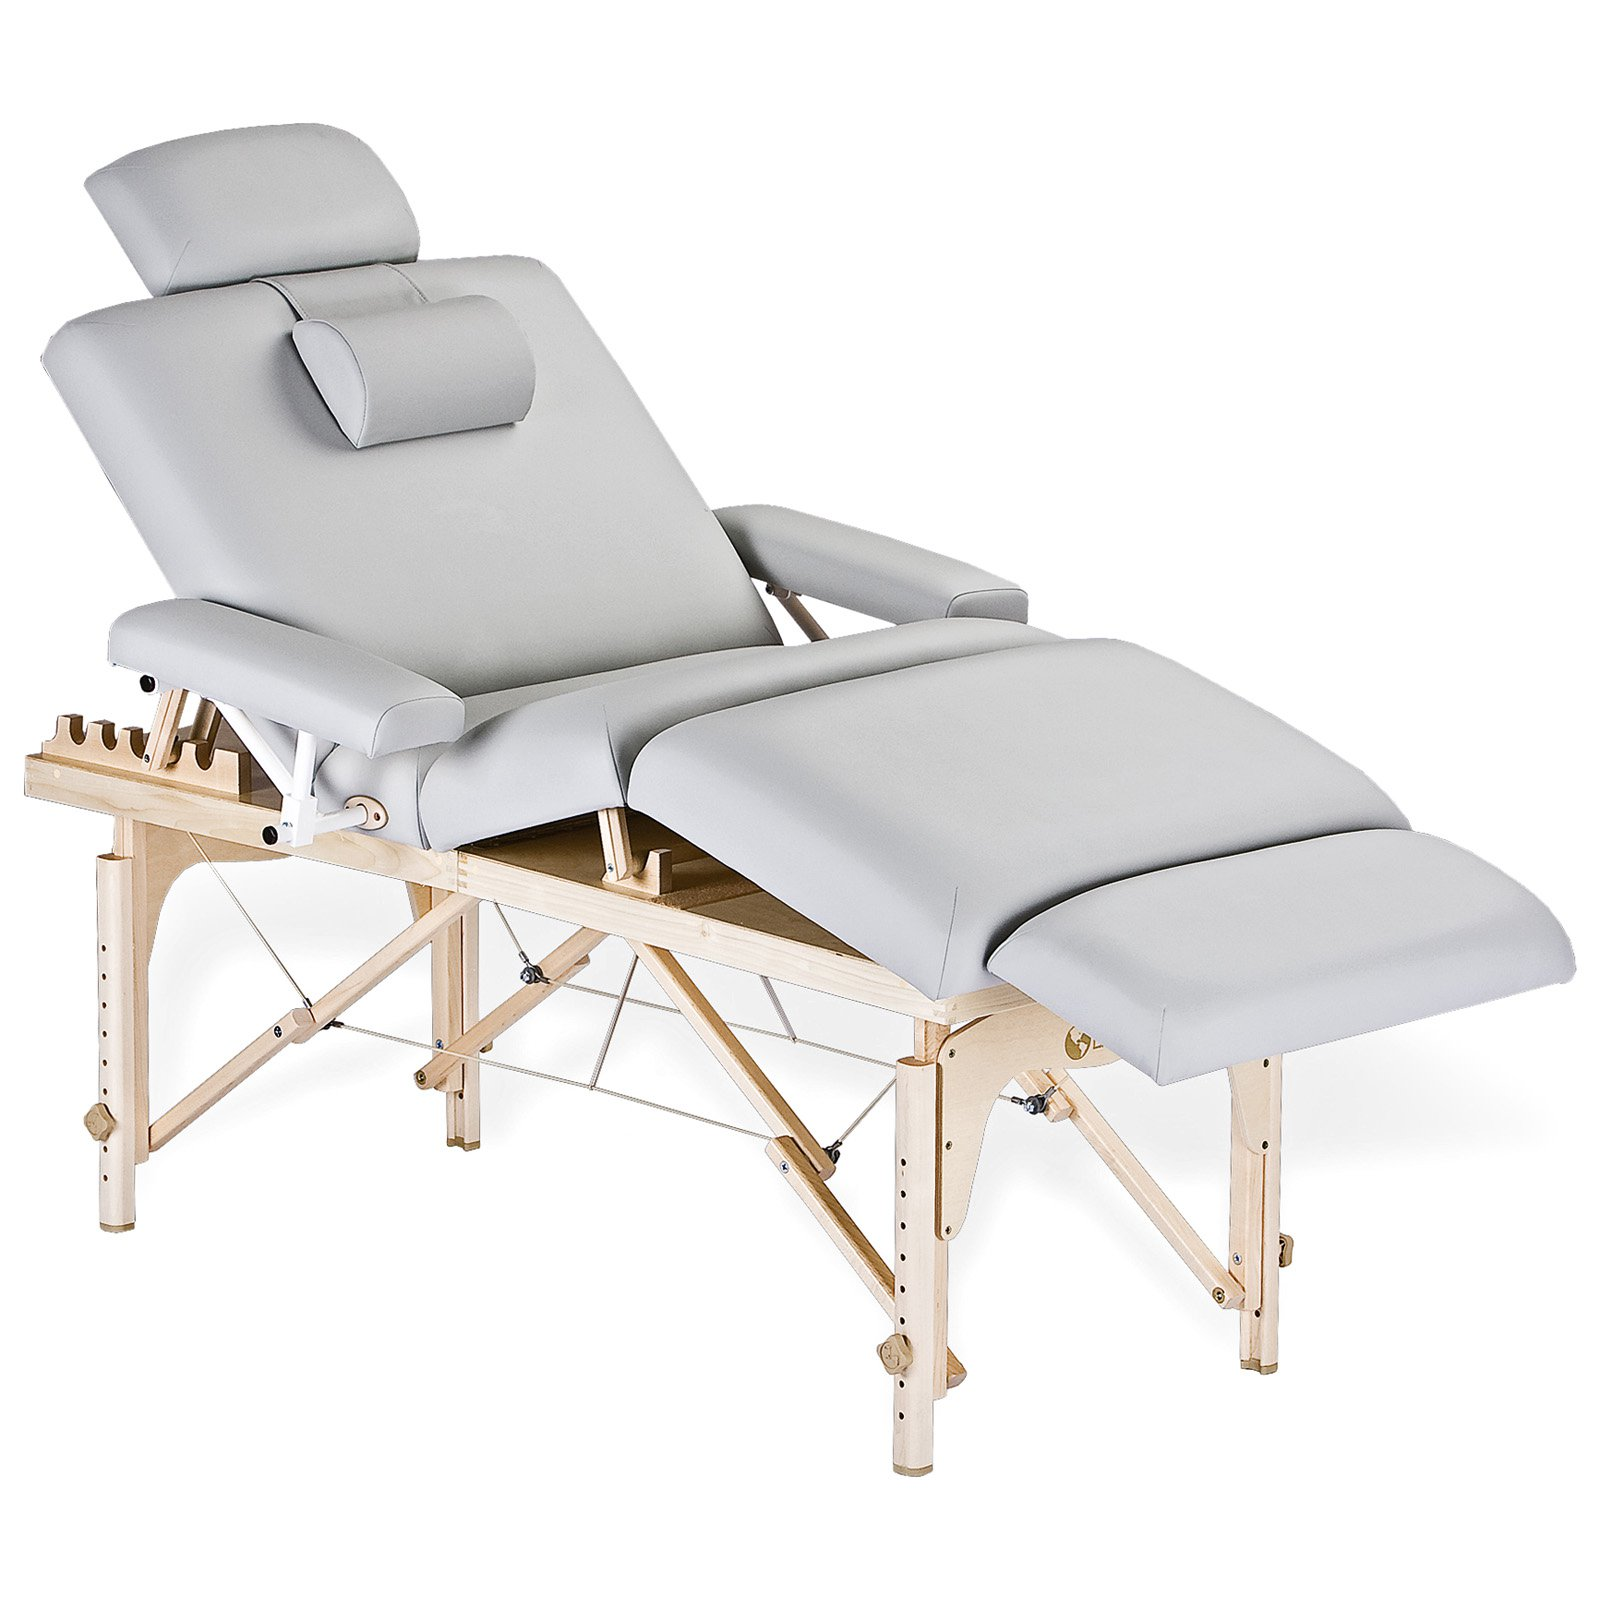 EarthLite Calistoga Salon Portable Massage Table